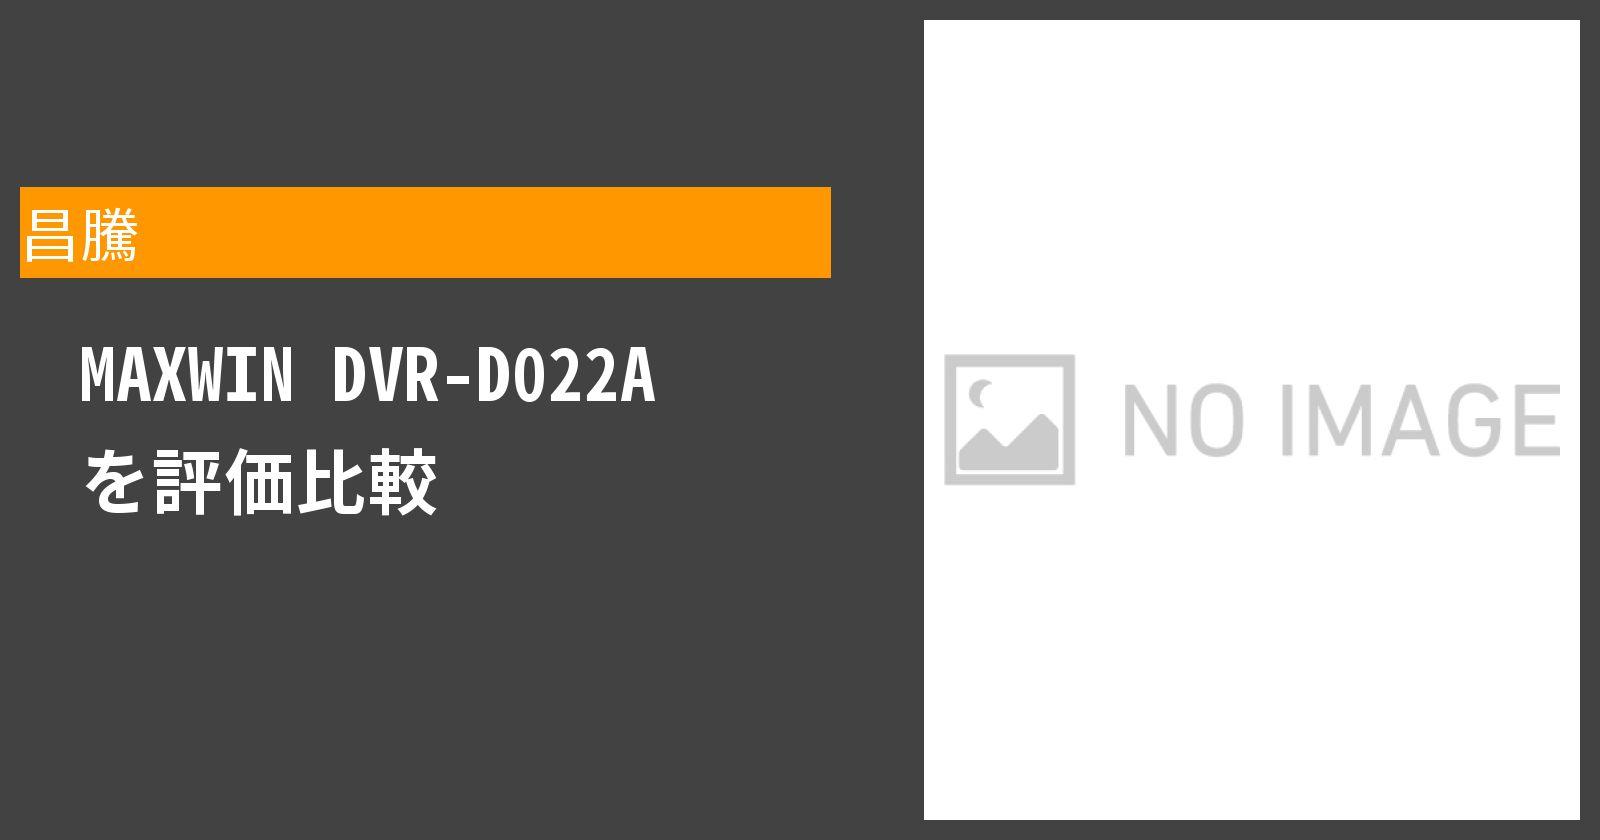 MAXWIN DVR-D022Aを徹底評価